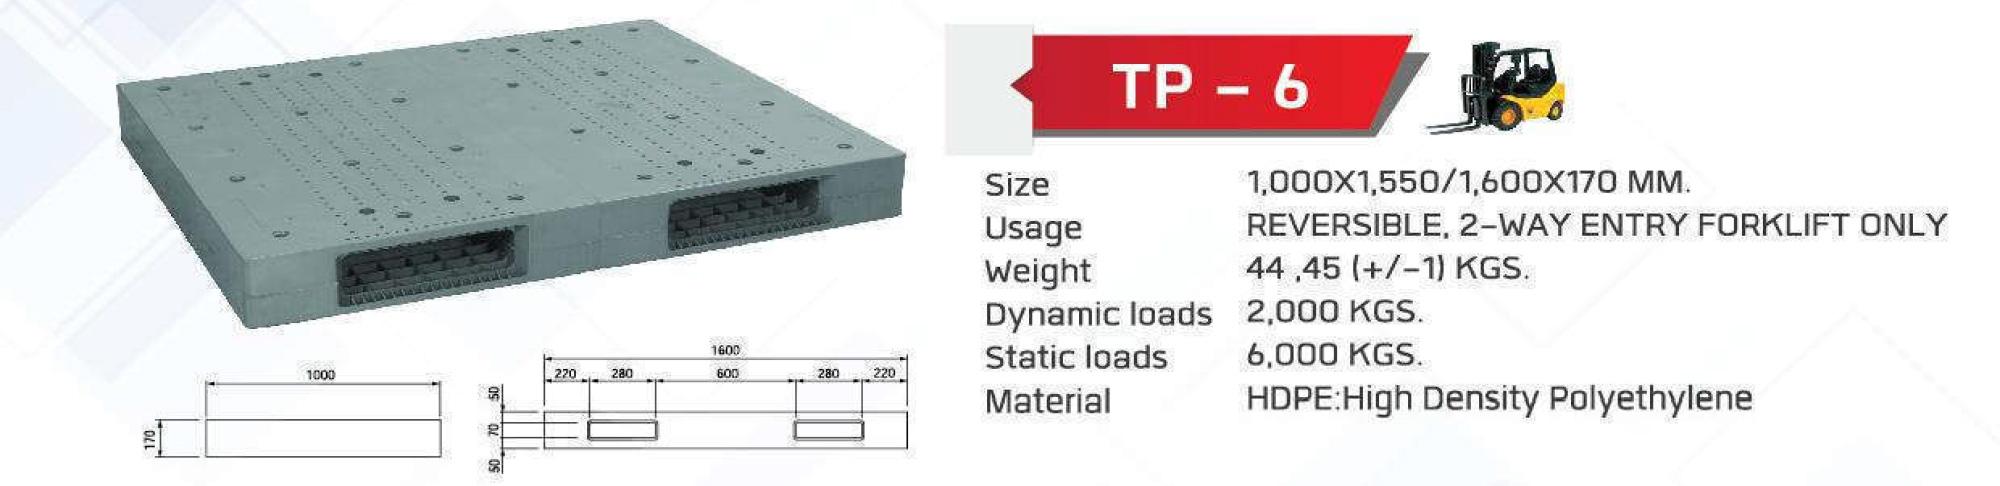 Reversible-HeavyDuty-TP-6